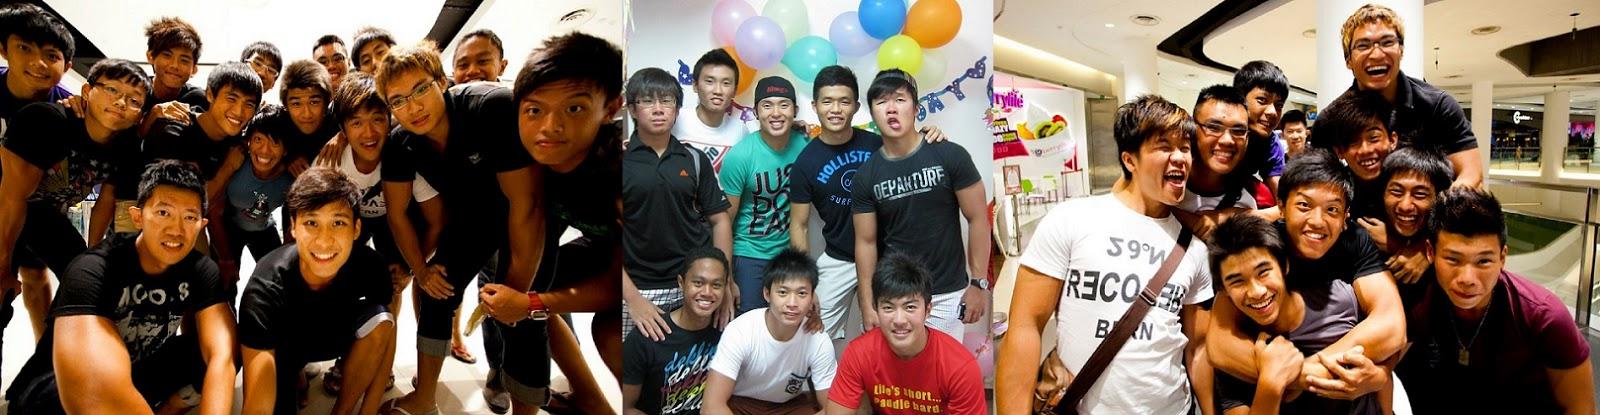 ManSA (Manhunt Singapore Alumni): AGE IS NO BARRIER